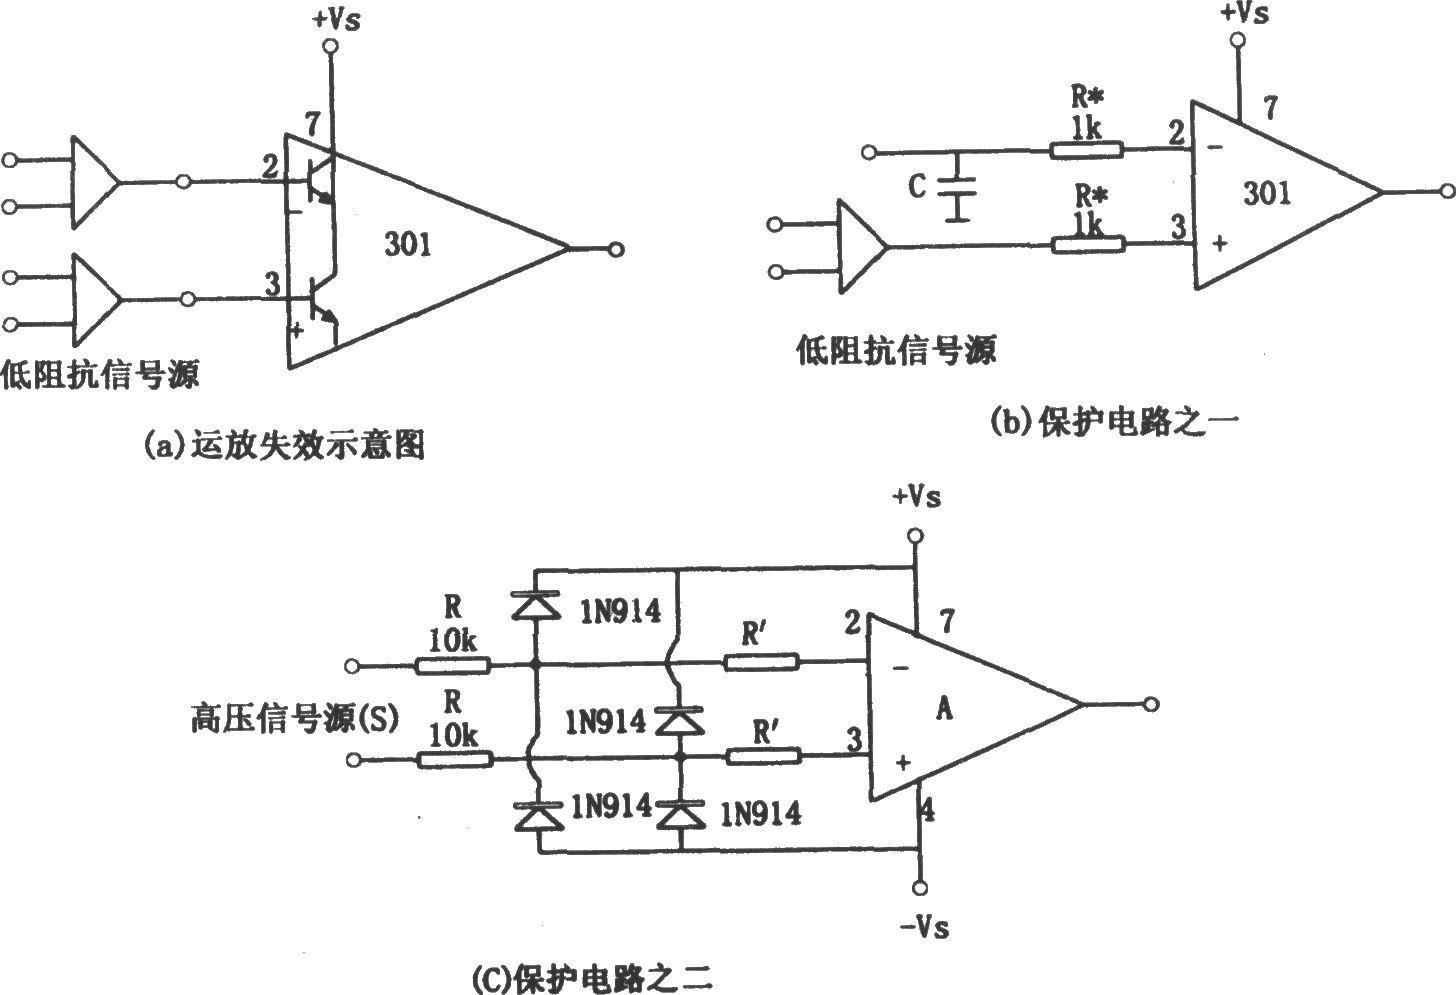 Vs正常工作时,输入端对 Vs而言总是负值,所以输入级两个晶体管的集电极一基极之间不会出现正向偏置。但是。如果把电源电压 Vs从电路中撤除,而和脚仍保持正电位,即仍有共模输入电压。晶体管的集电结将有一股电流由基极流向集电极。若从2脚或脚向电源看去的源电阻很低,此时形成的集电结电流就会很大,以至于可以损坏输入级晶体管,这种现象在先去掉电源电压,而信号源未撤除时。会出现共模输入使集成运放失效和损坏的情况。使集成运放的共模输入失效的另一种情况是,若信号源含有电容元件,这个电容充电到信号源的高电位时,将电源电